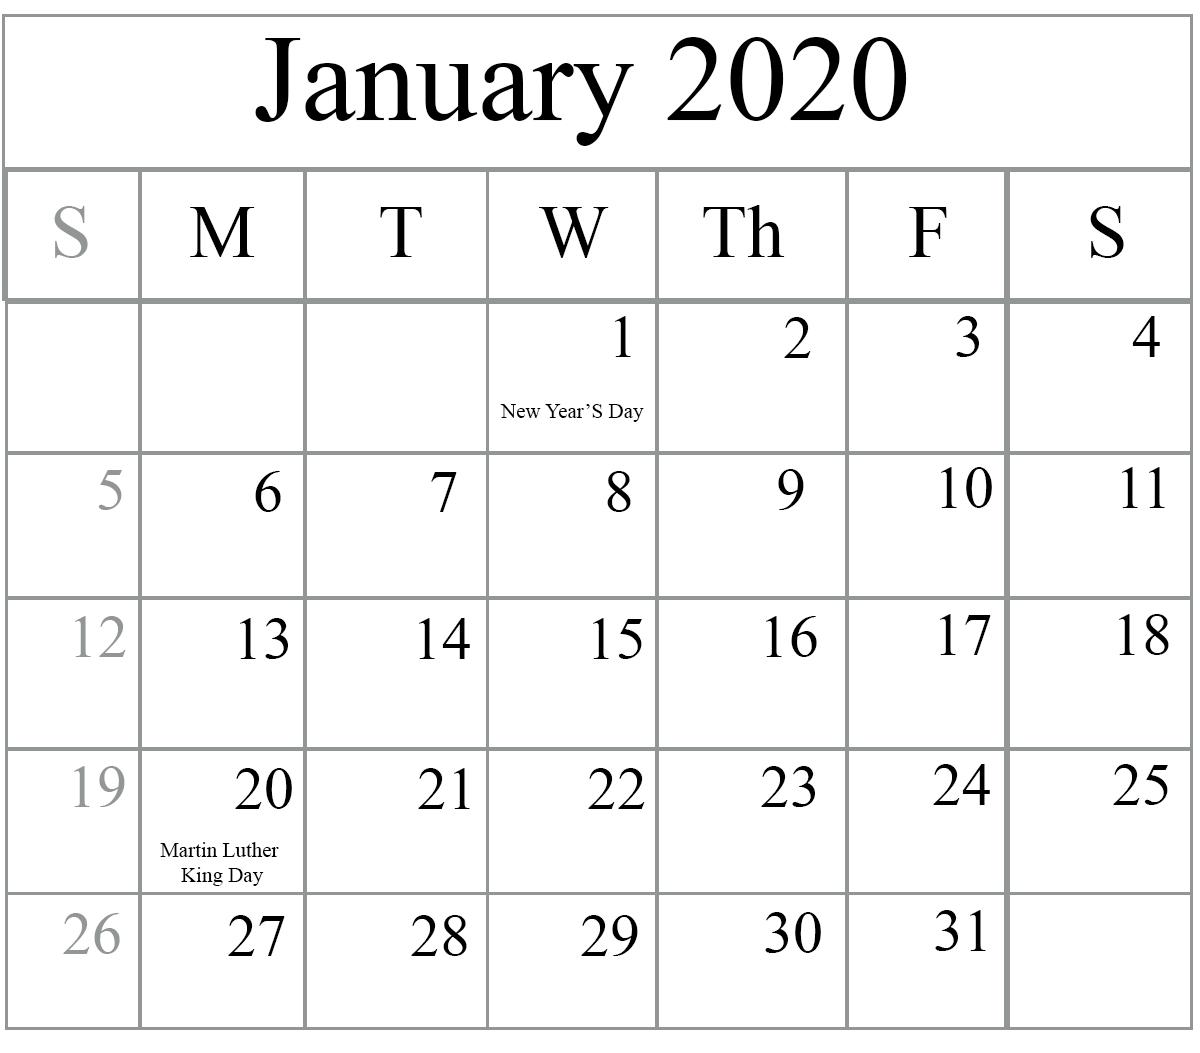 Free January 2020 Printable Calendar In Pdf, Excel & Word in 2020 Calendar You Can Edit